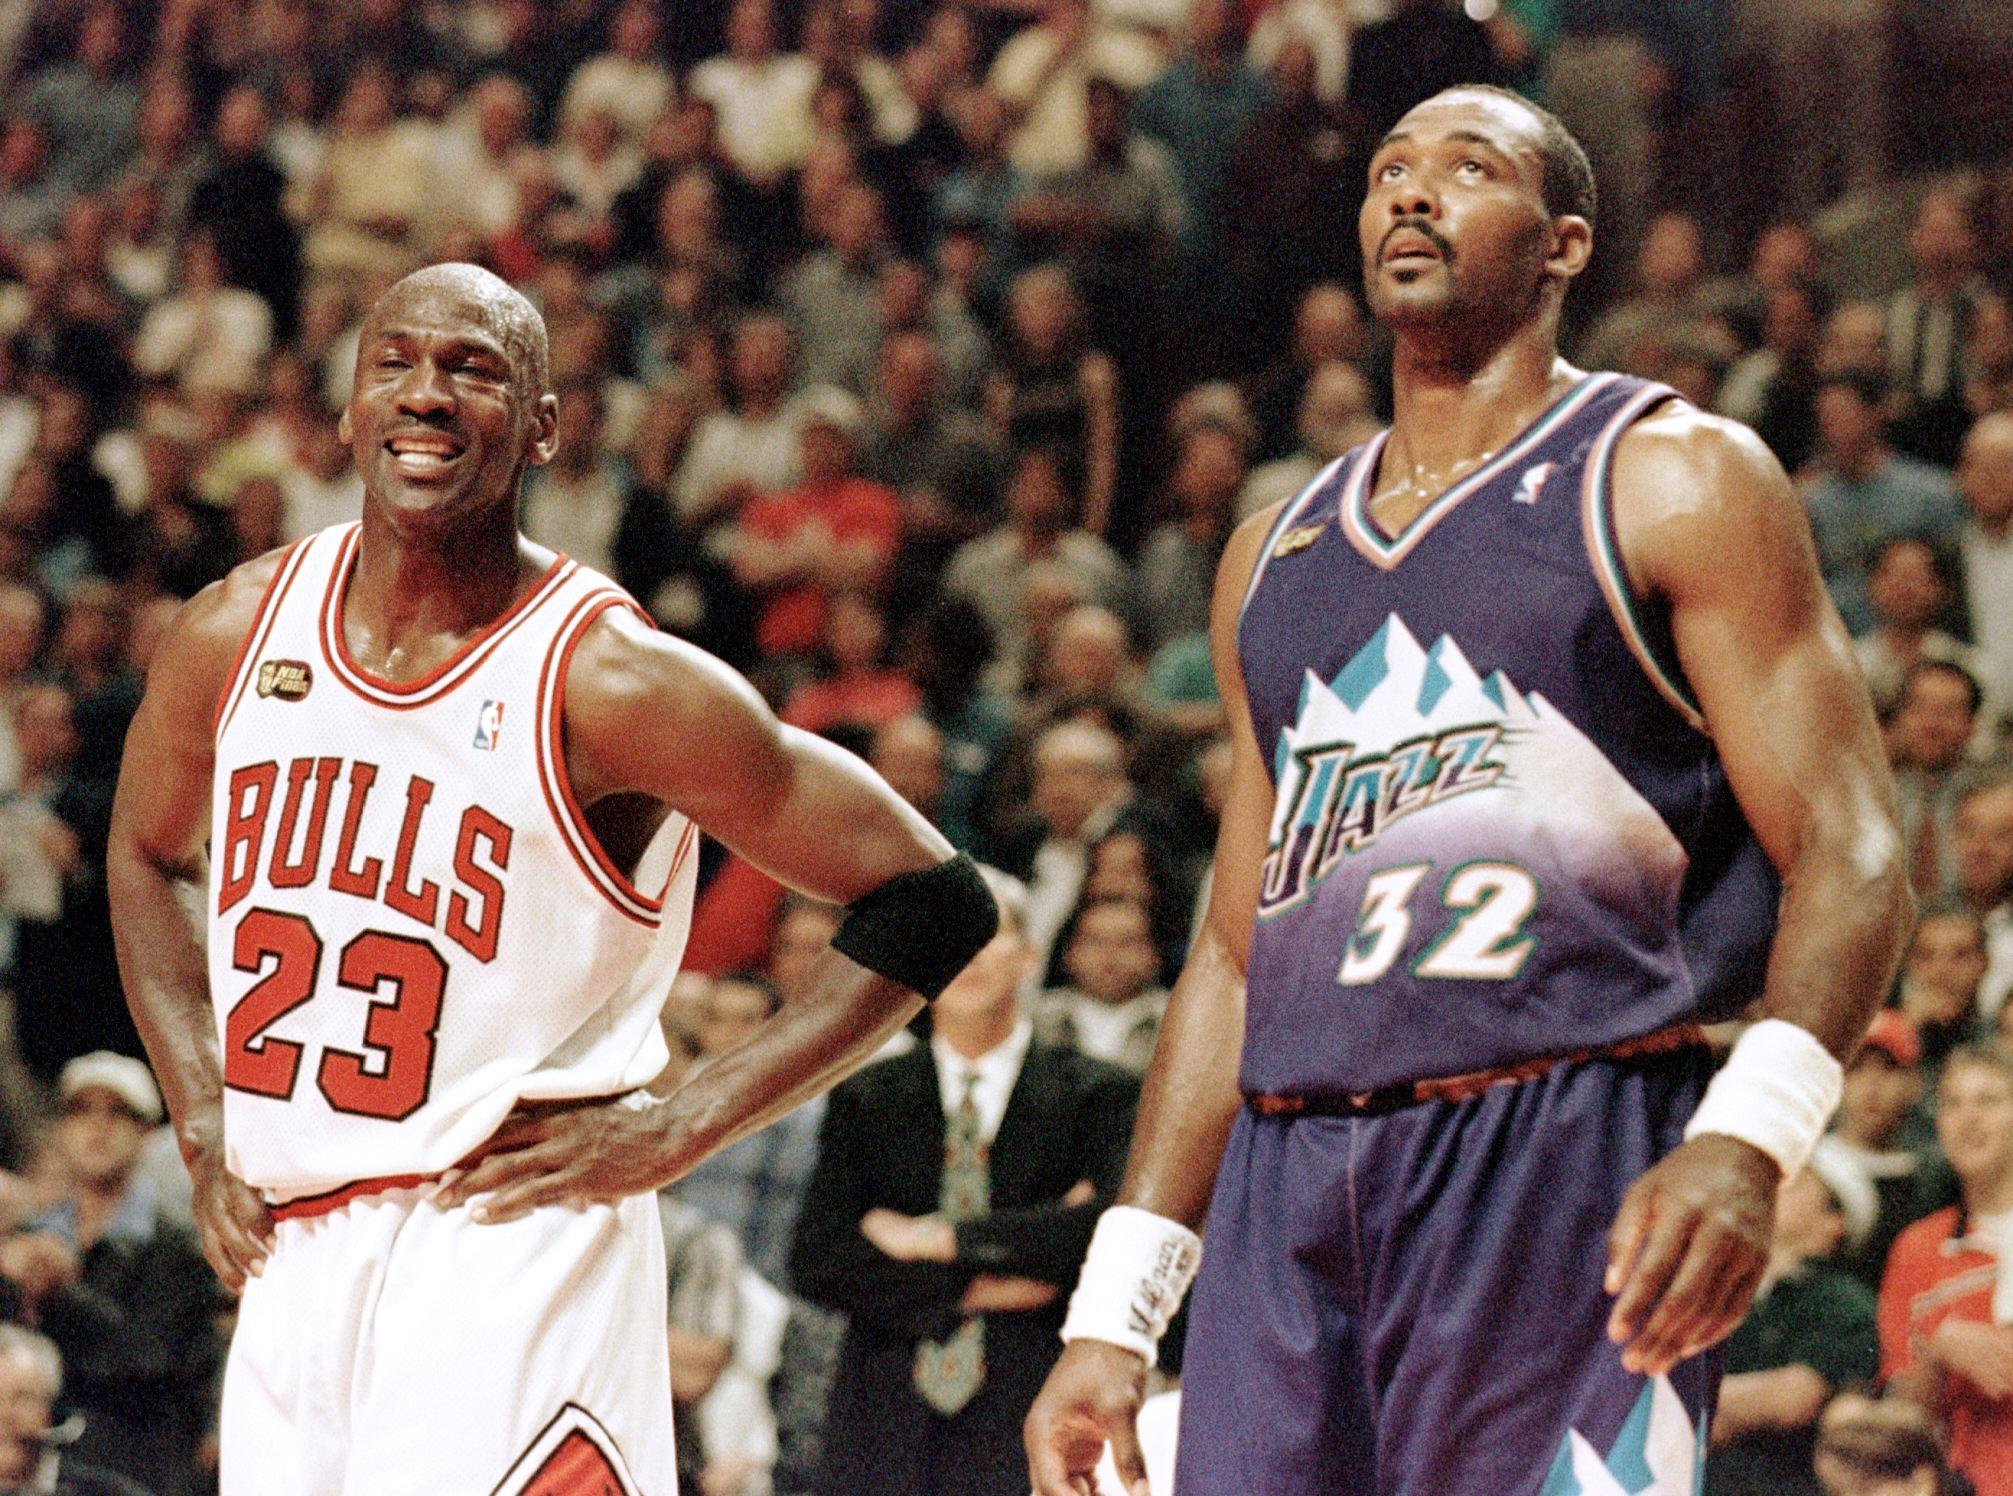 Karl Malone respects Michael Jordan, but 'I was a bad SOB, too'